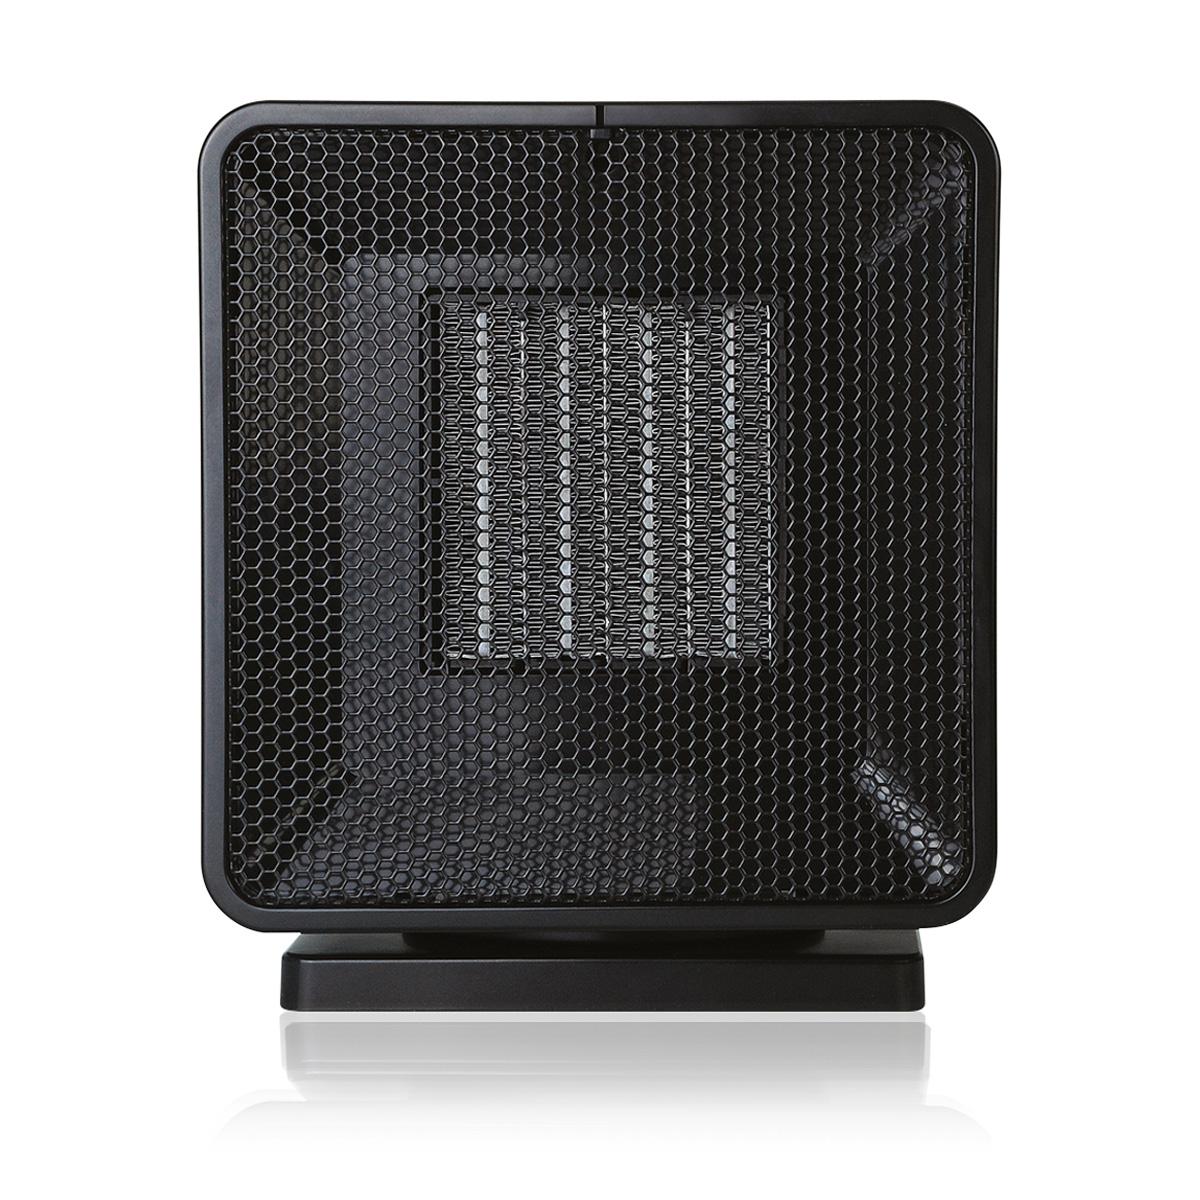 Omega Altise Product Compact Ceramic Heater - Black(ACUBOB)